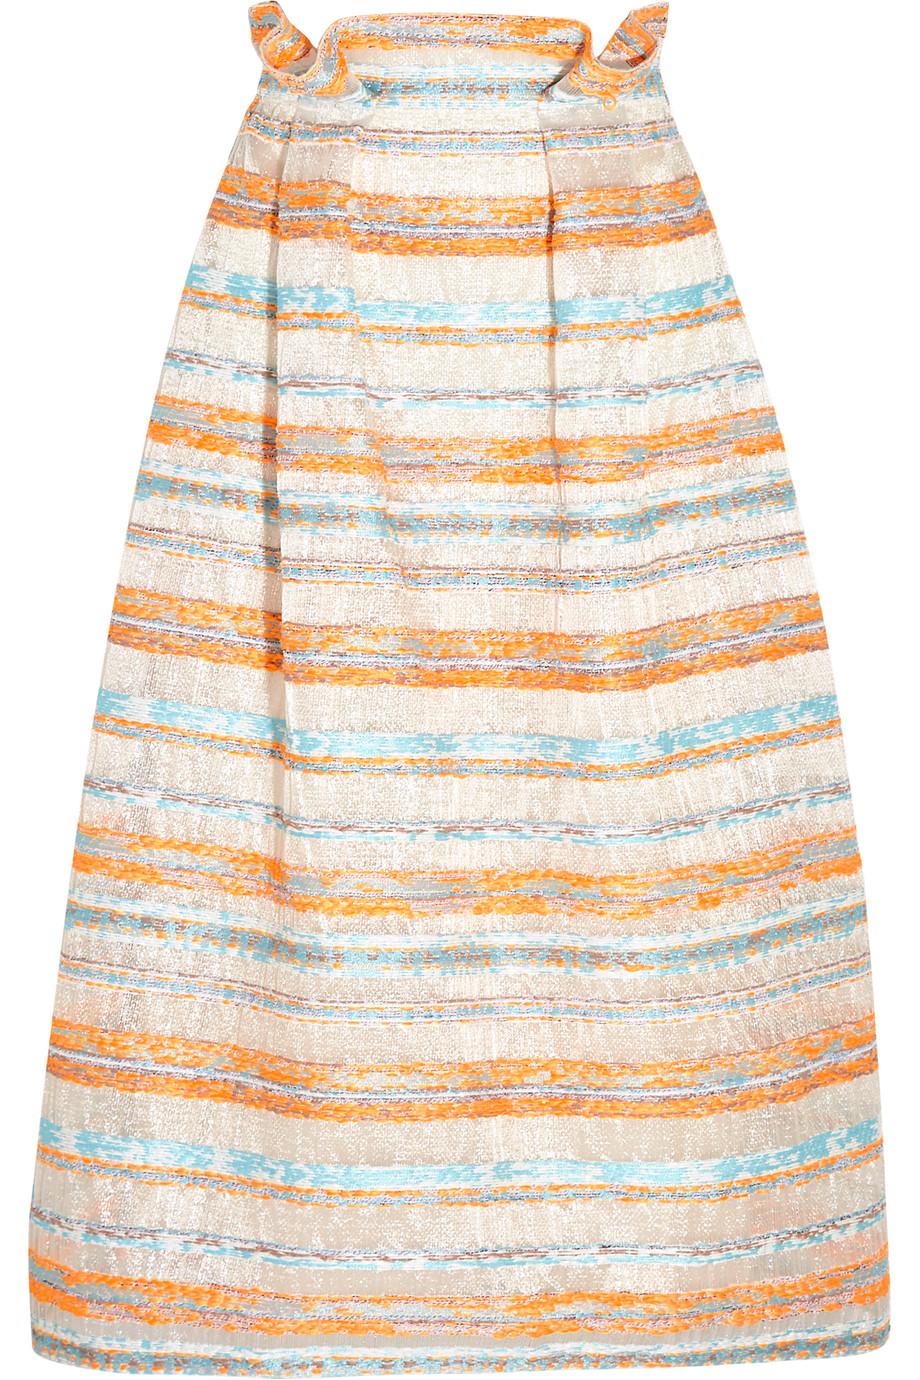 Roksanda Jenna Woven Metallic Raffia Midi Skirt, Pastel Orange, Women's, Size: 8